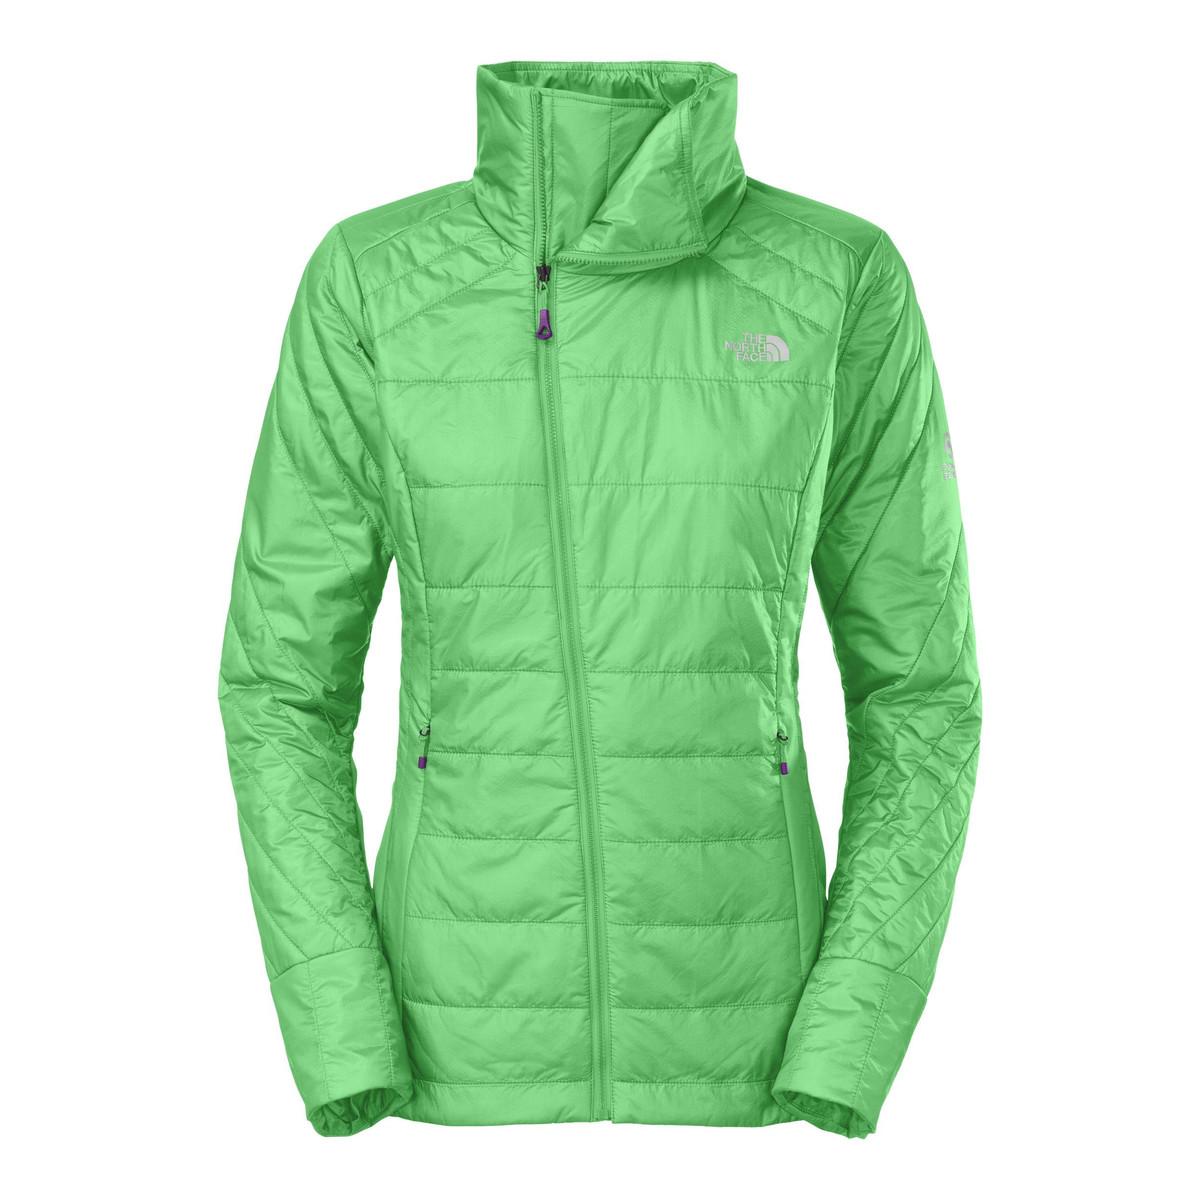 The North Face Nima Jacket